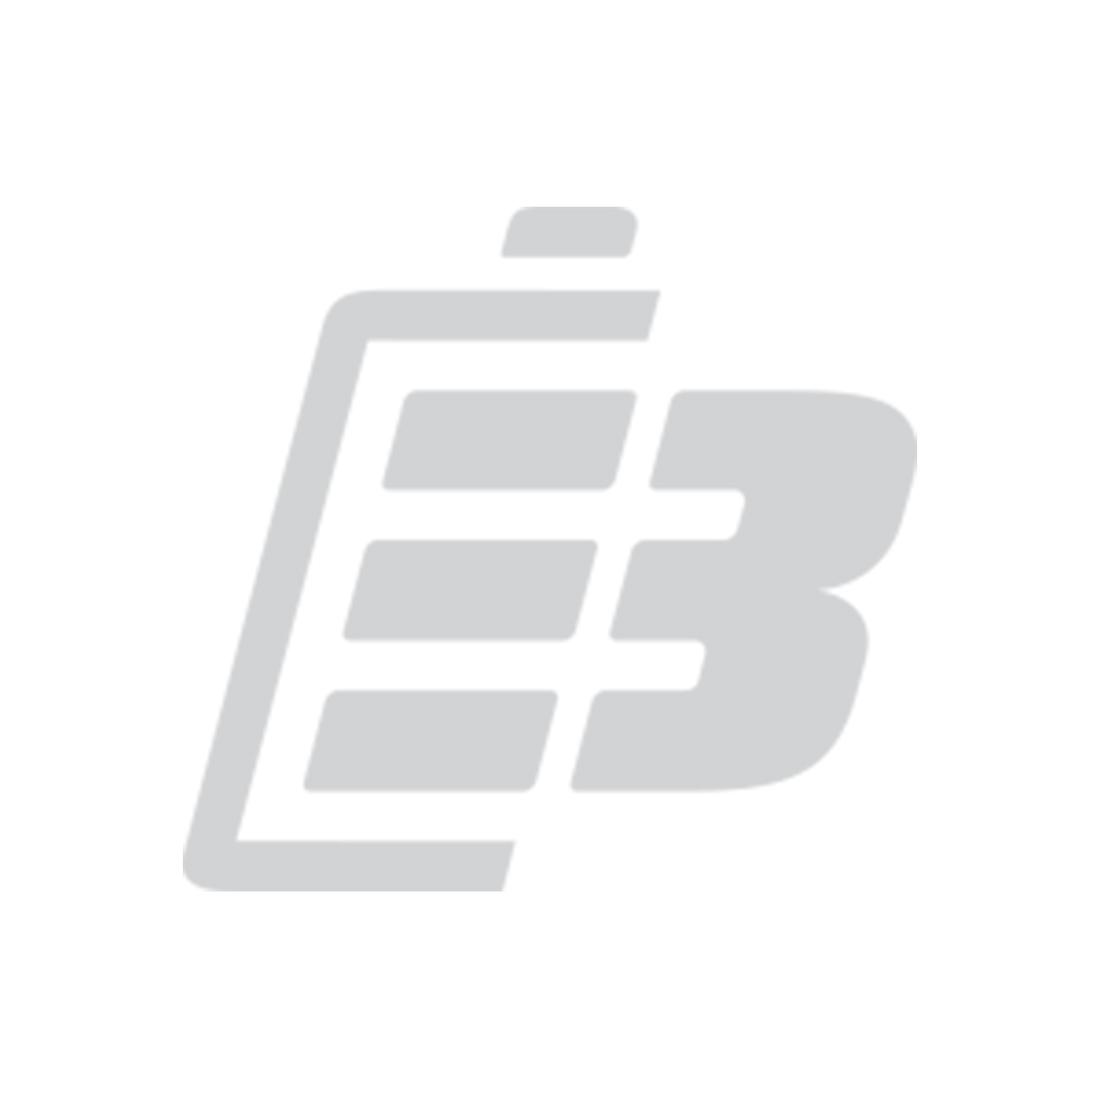 Wireless router battery ZTE MF63_1